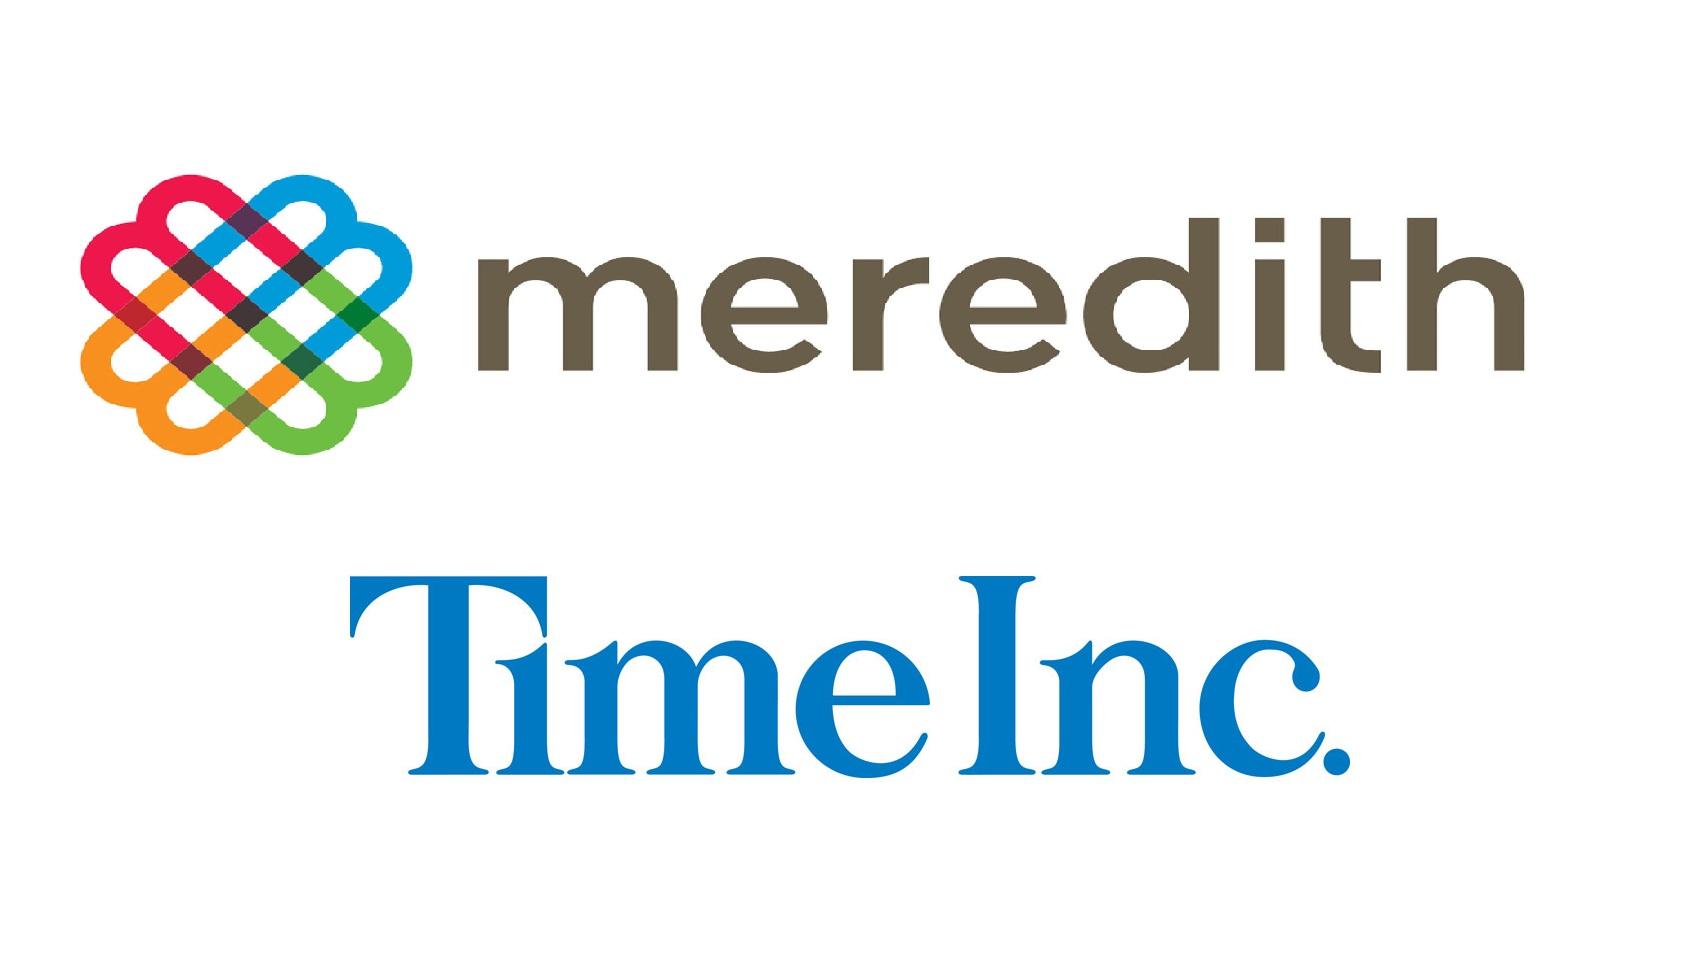 meredith time inc - Multimedia. USA: Meredith acquista Time Inc. Target: piattaforma per 200 mln di utenti